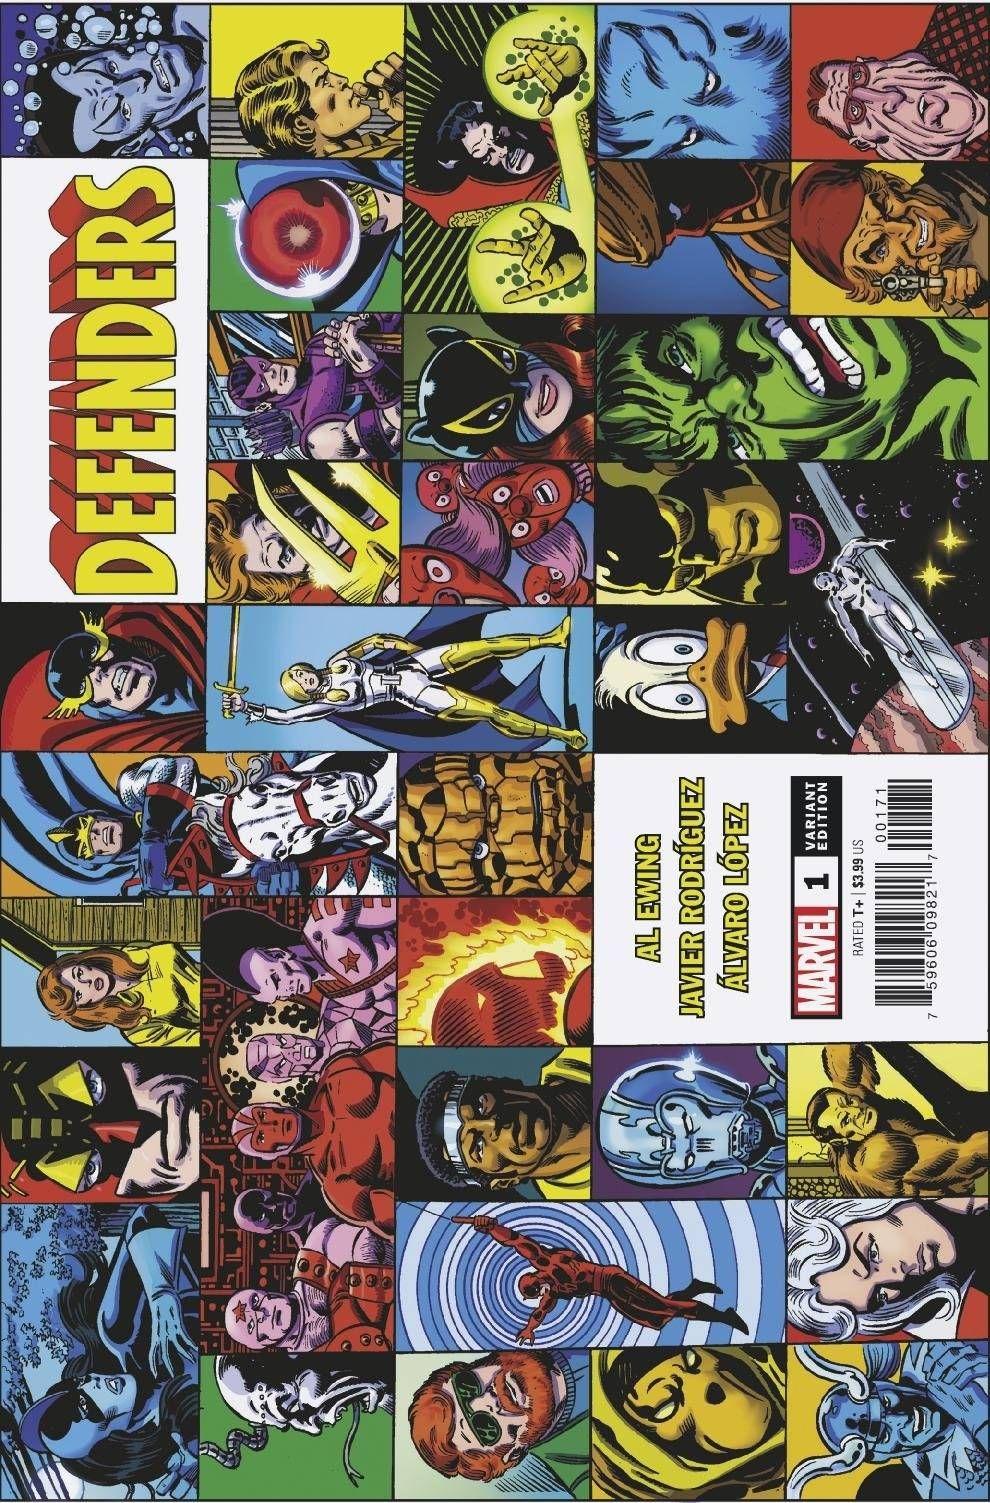 eyJidWNrZXQiOiJnb2NvbGxlY3QuaW1hZ2VzLnB1YiIsImtleSI6ImI0ODE1M2M2LTE5N2UtNDlhZC1hODM1LWUyNGVjMGIzMTI5OS5qcGciLCJlZGl0cyI6W119 ComicList: Marvel Comics New Releases for 08/11/2021